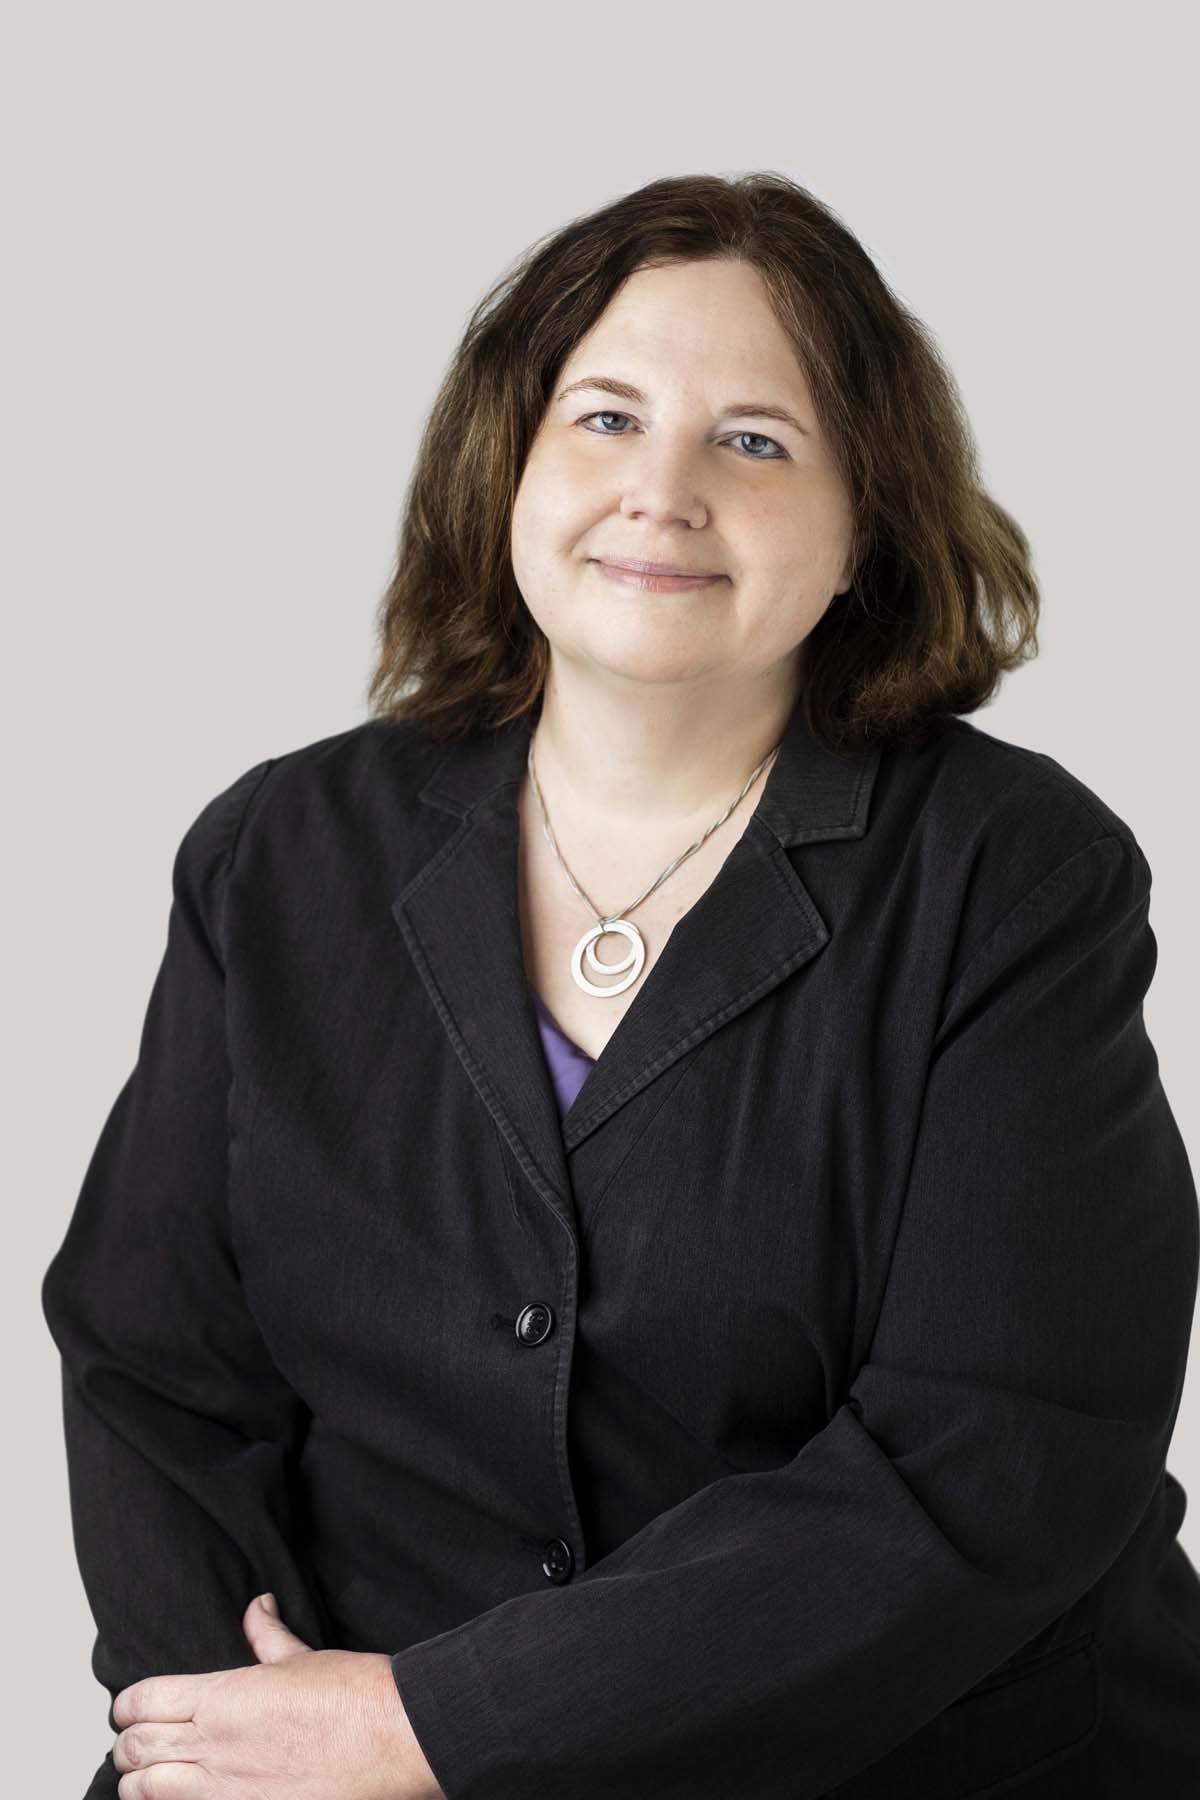 Margaret Hartsough